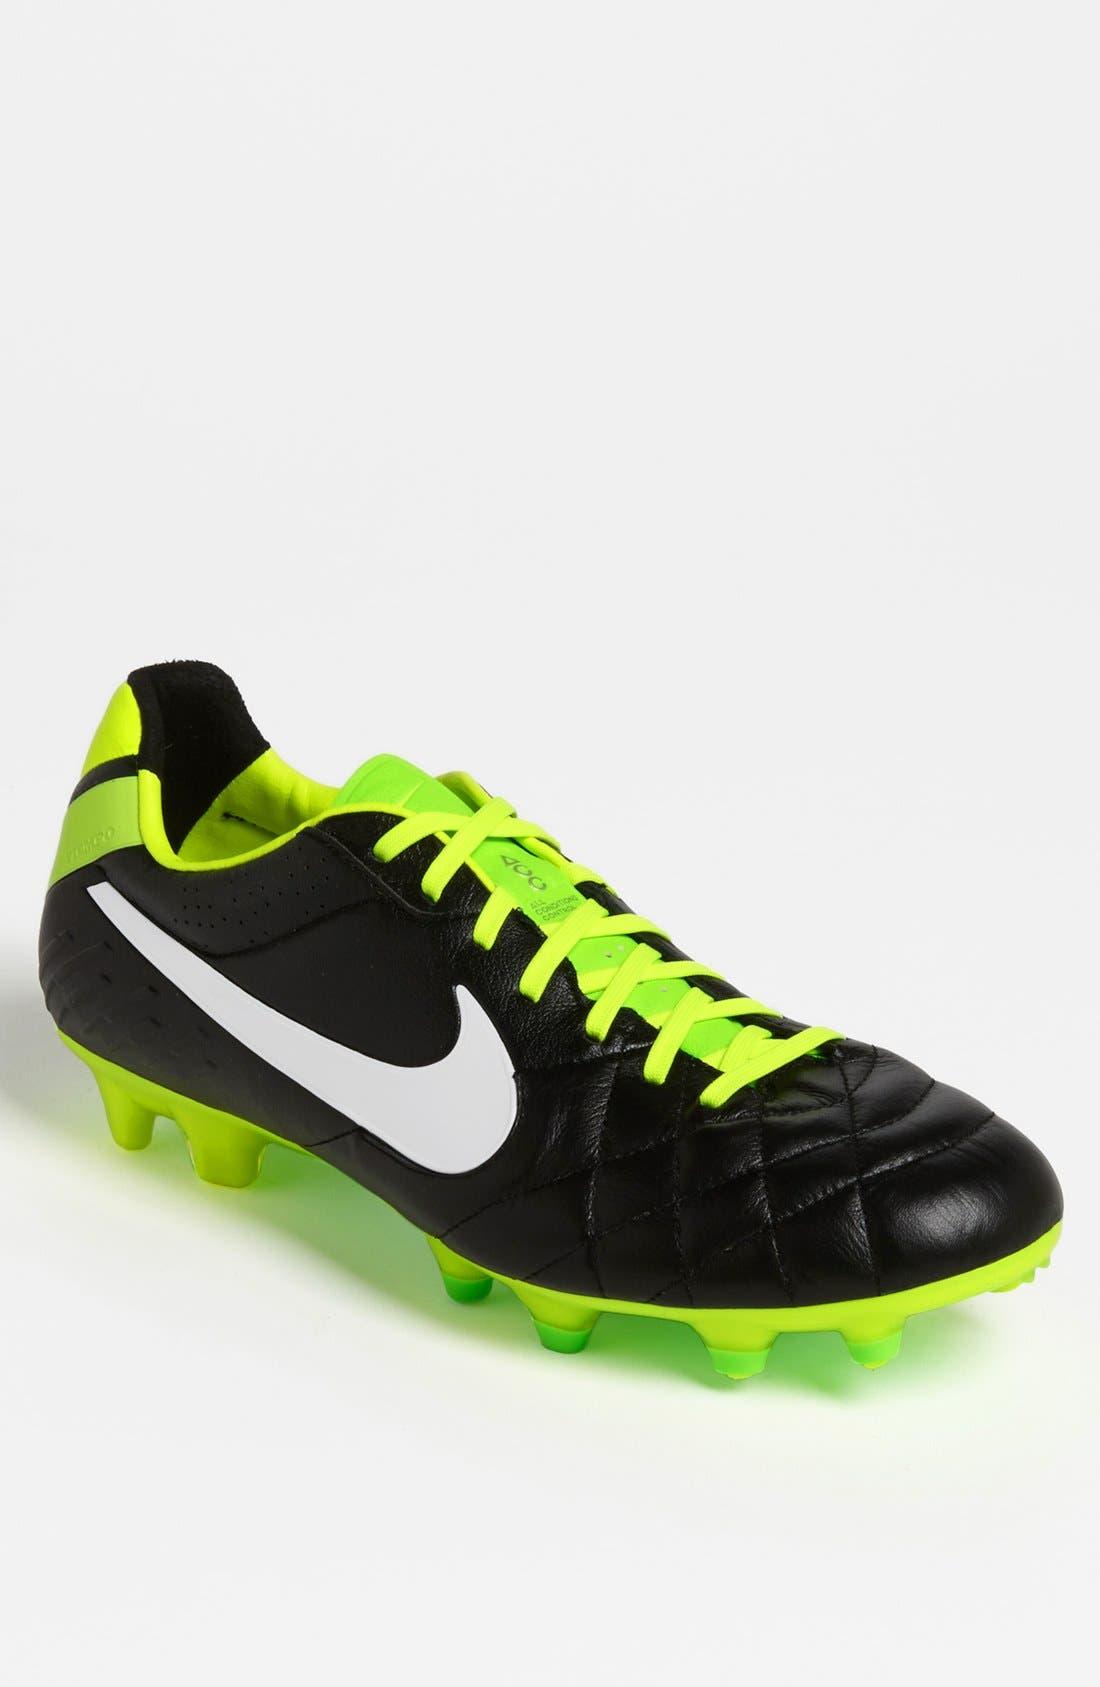 Alternate Image 1 Selected - Nike 'Tiempo Legend IV FG' Soccer Cleat (Men)